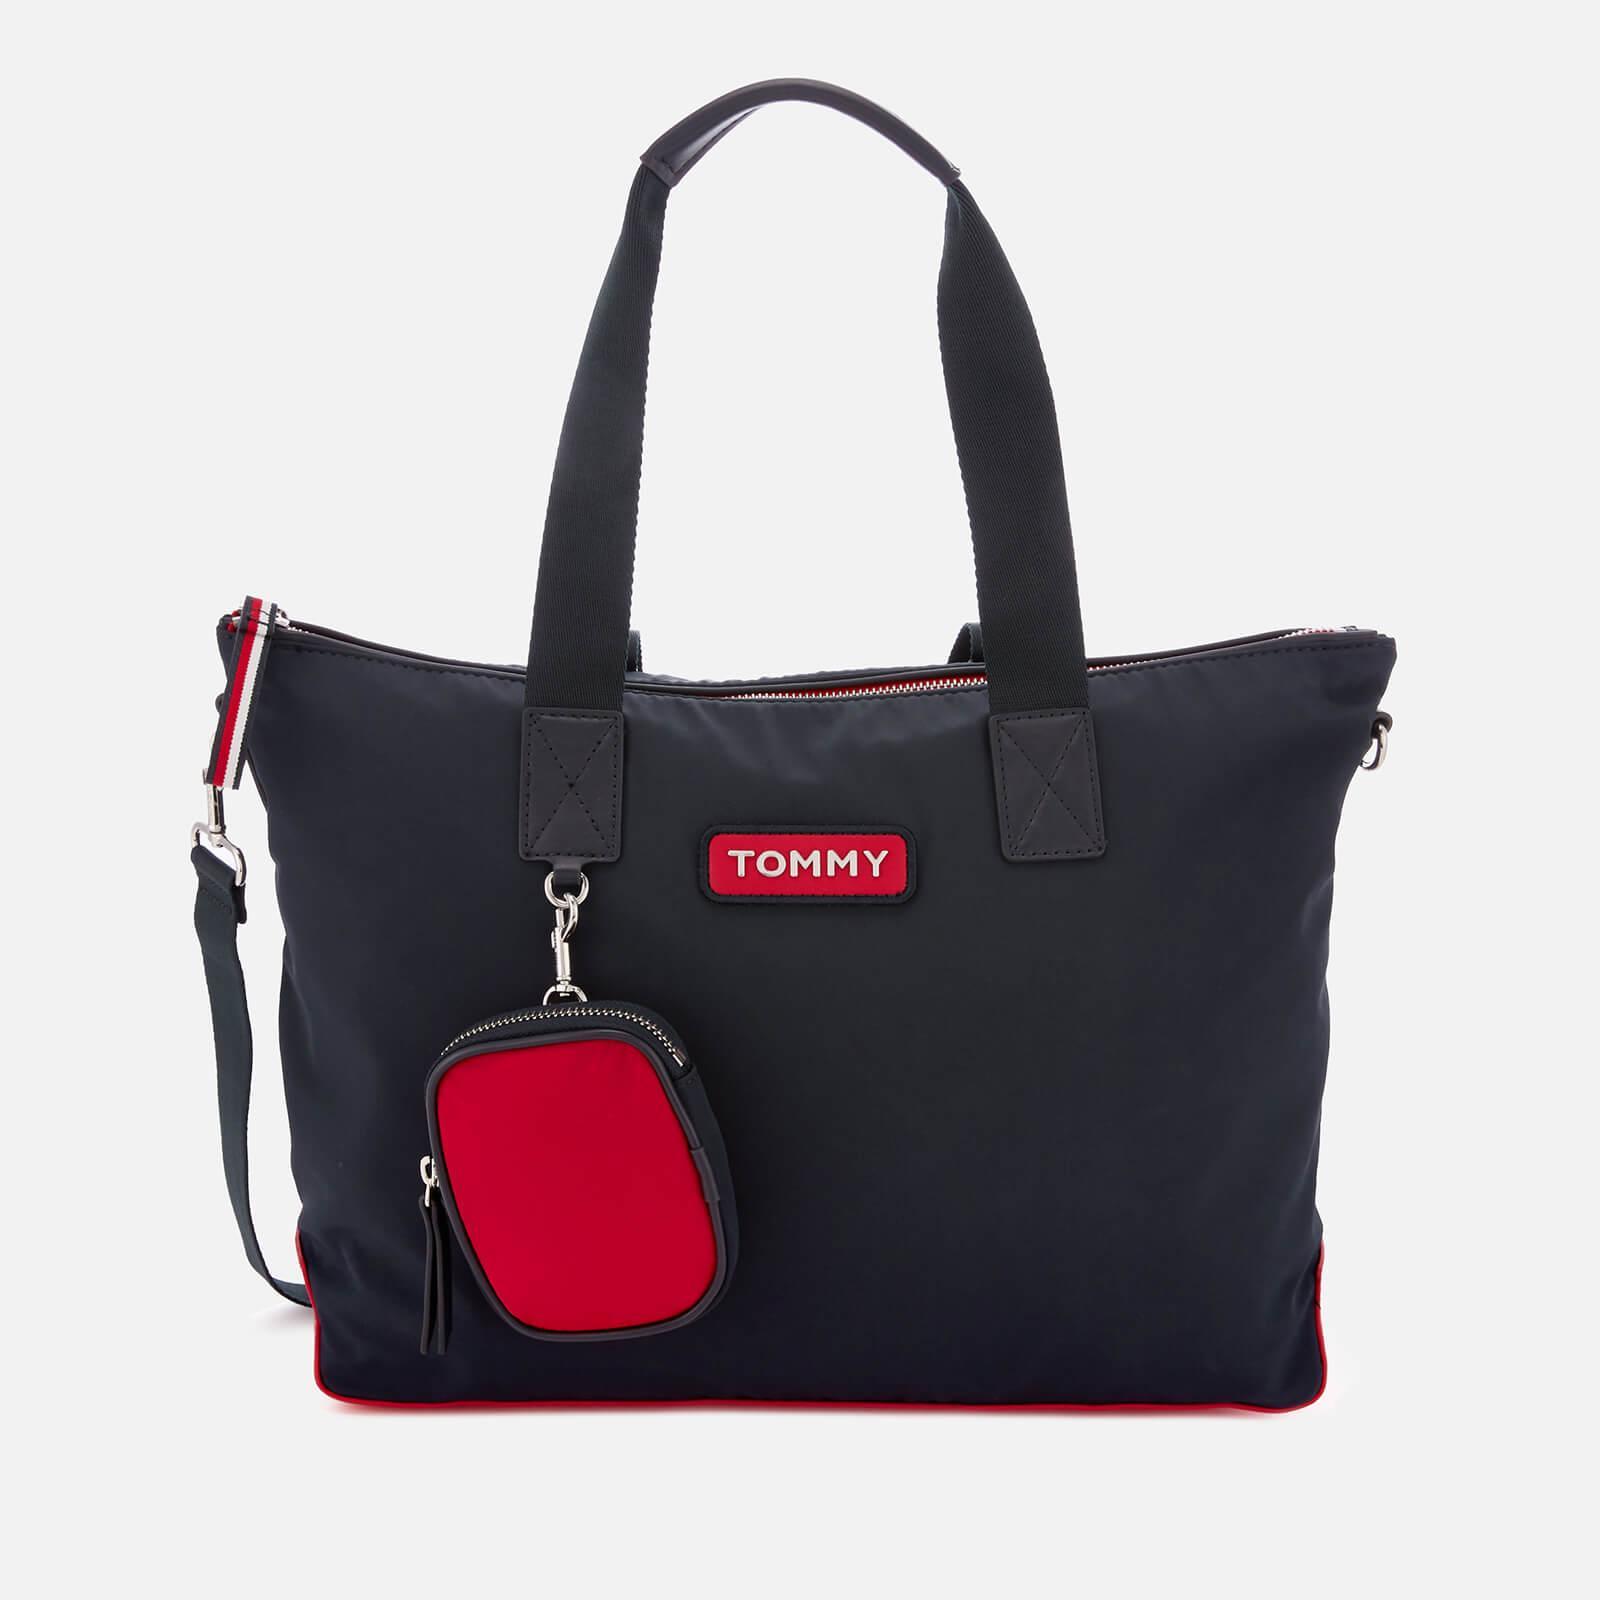 d0c7d7d1 Tommy Hilfiger. Women's Varsity Nylon Tote Bag